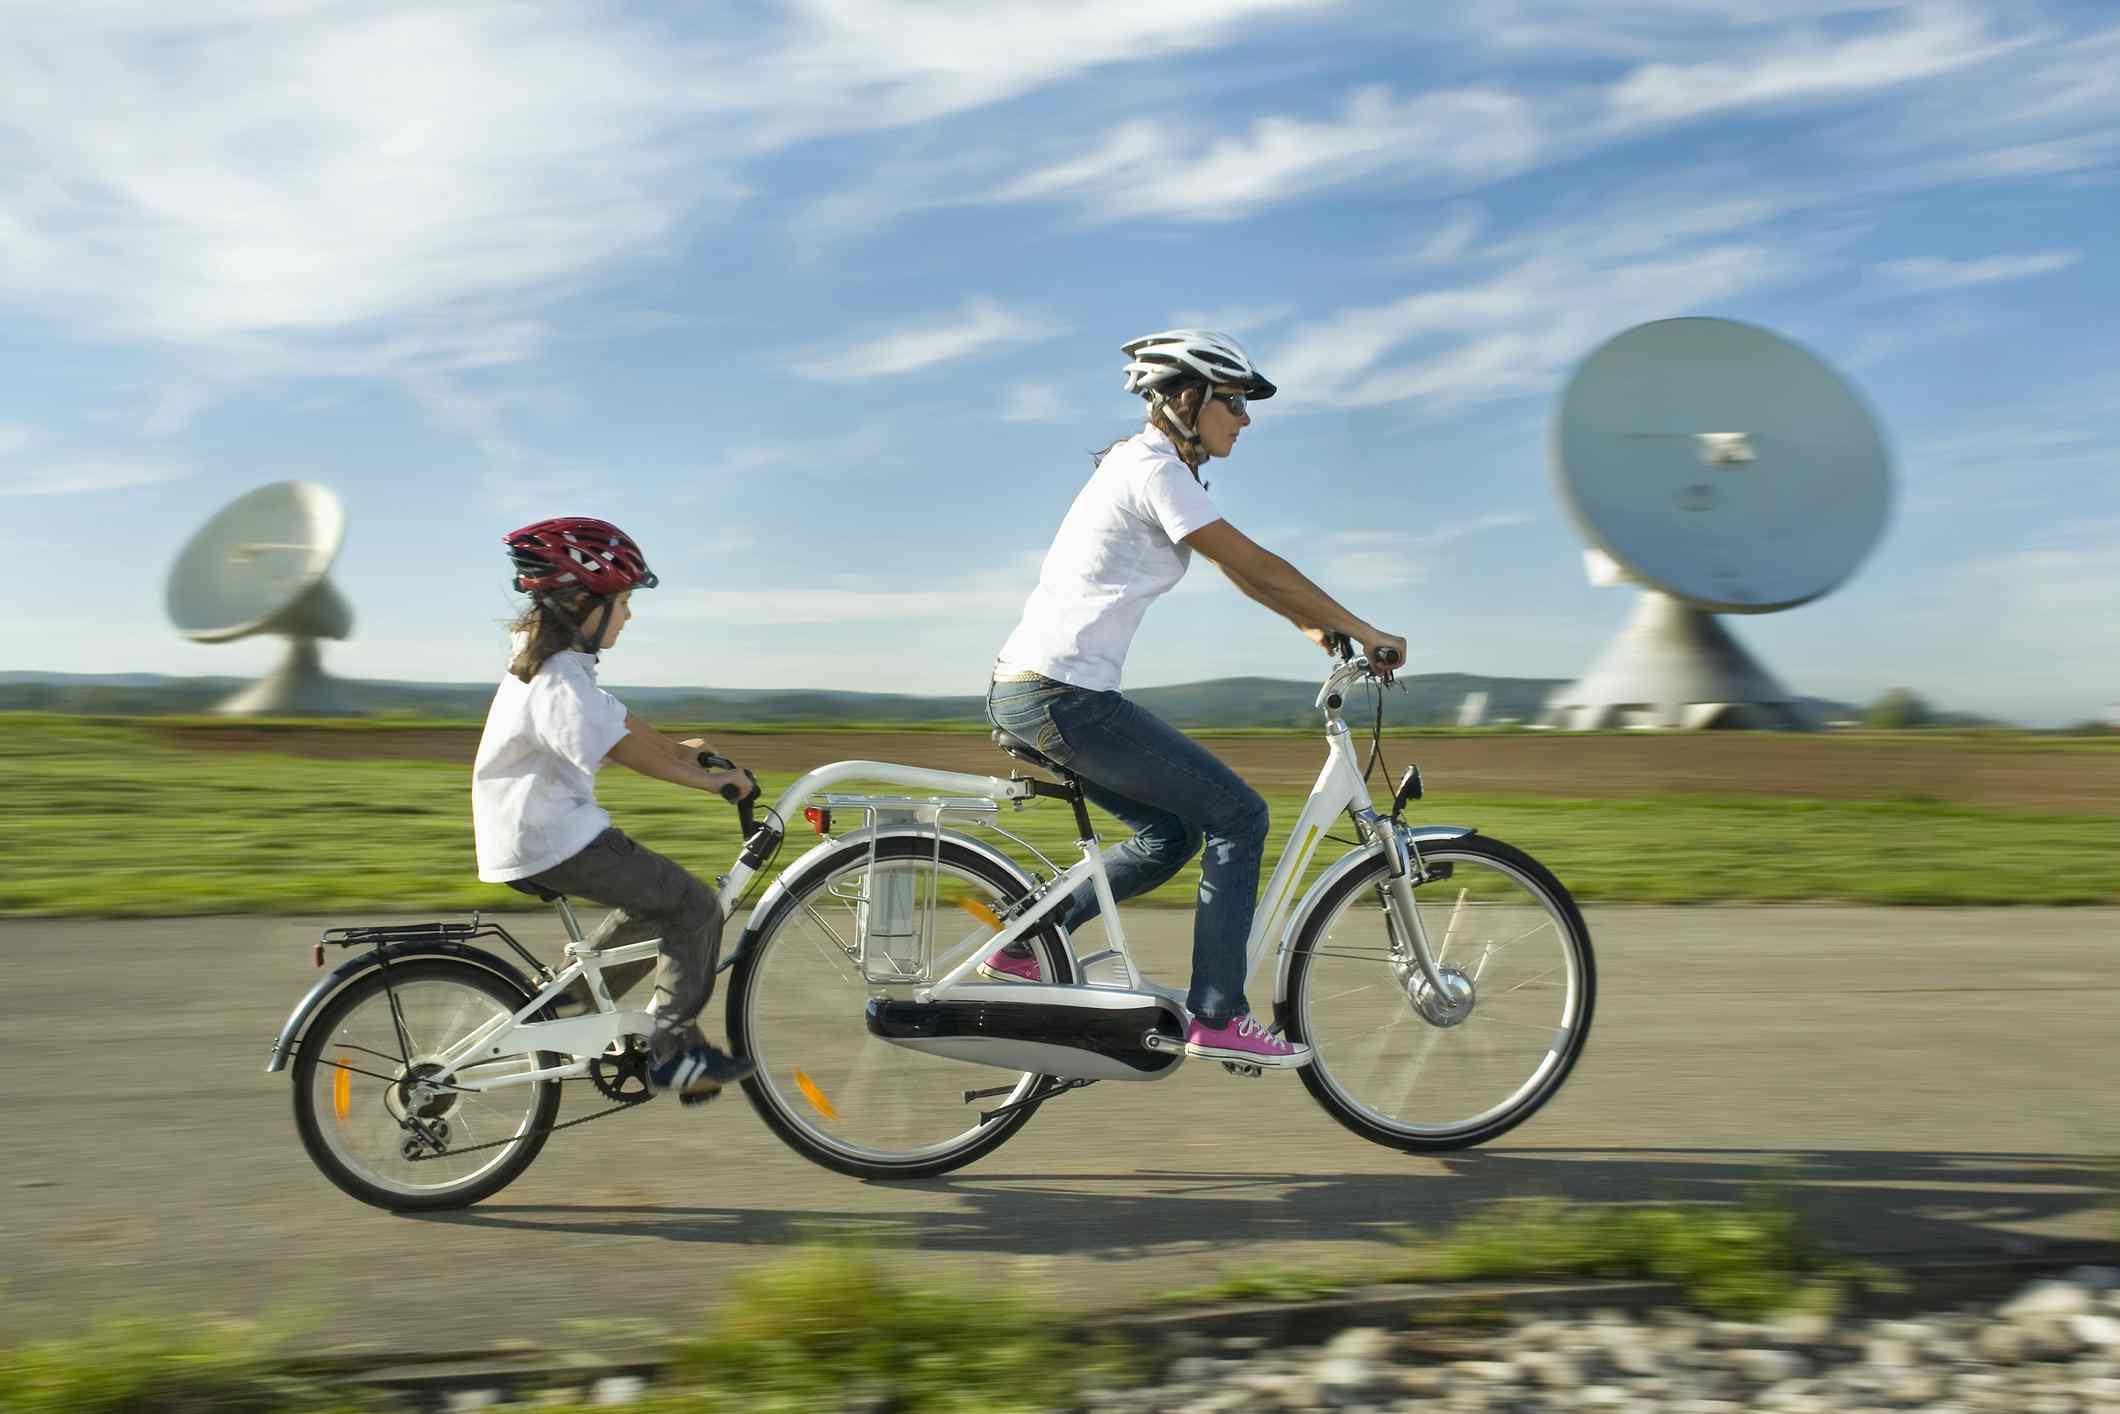 Germany, Bavaria, Raisting, Woman with girl riding electric bicycle near radio station